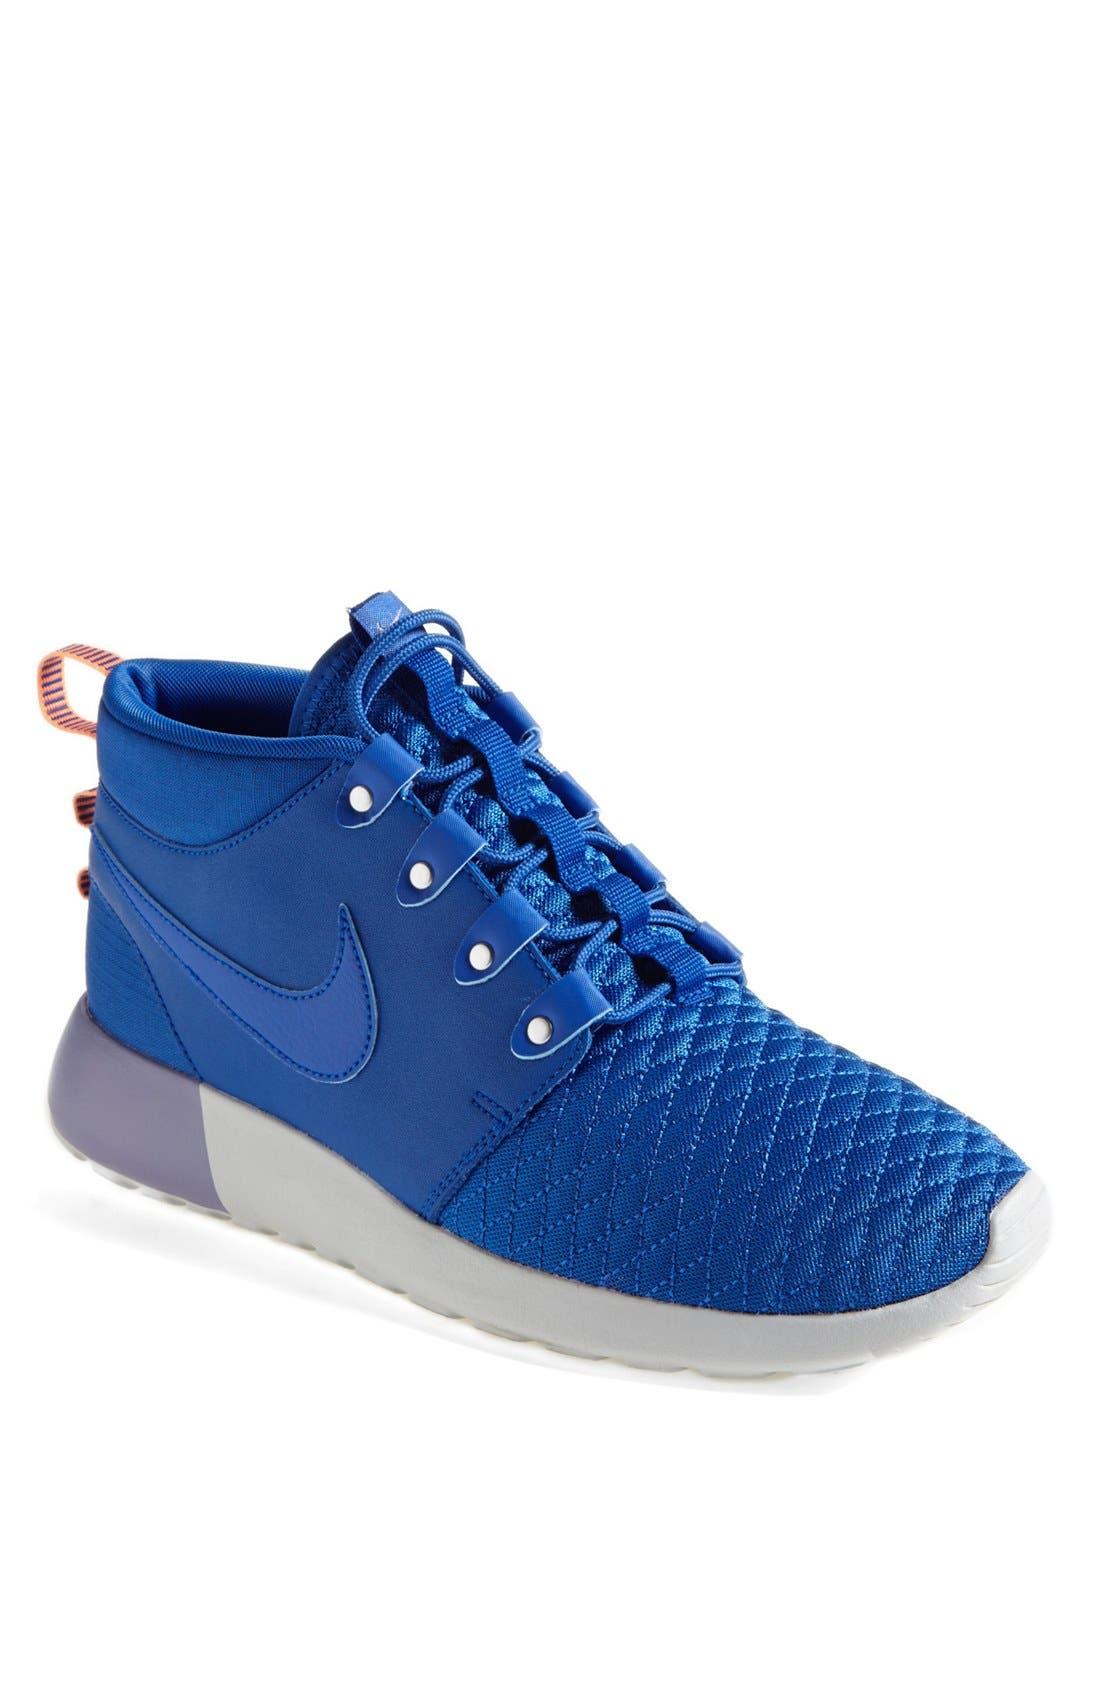 Main Image - Nike 'Roshe Run' Sneaker Boot (Men)